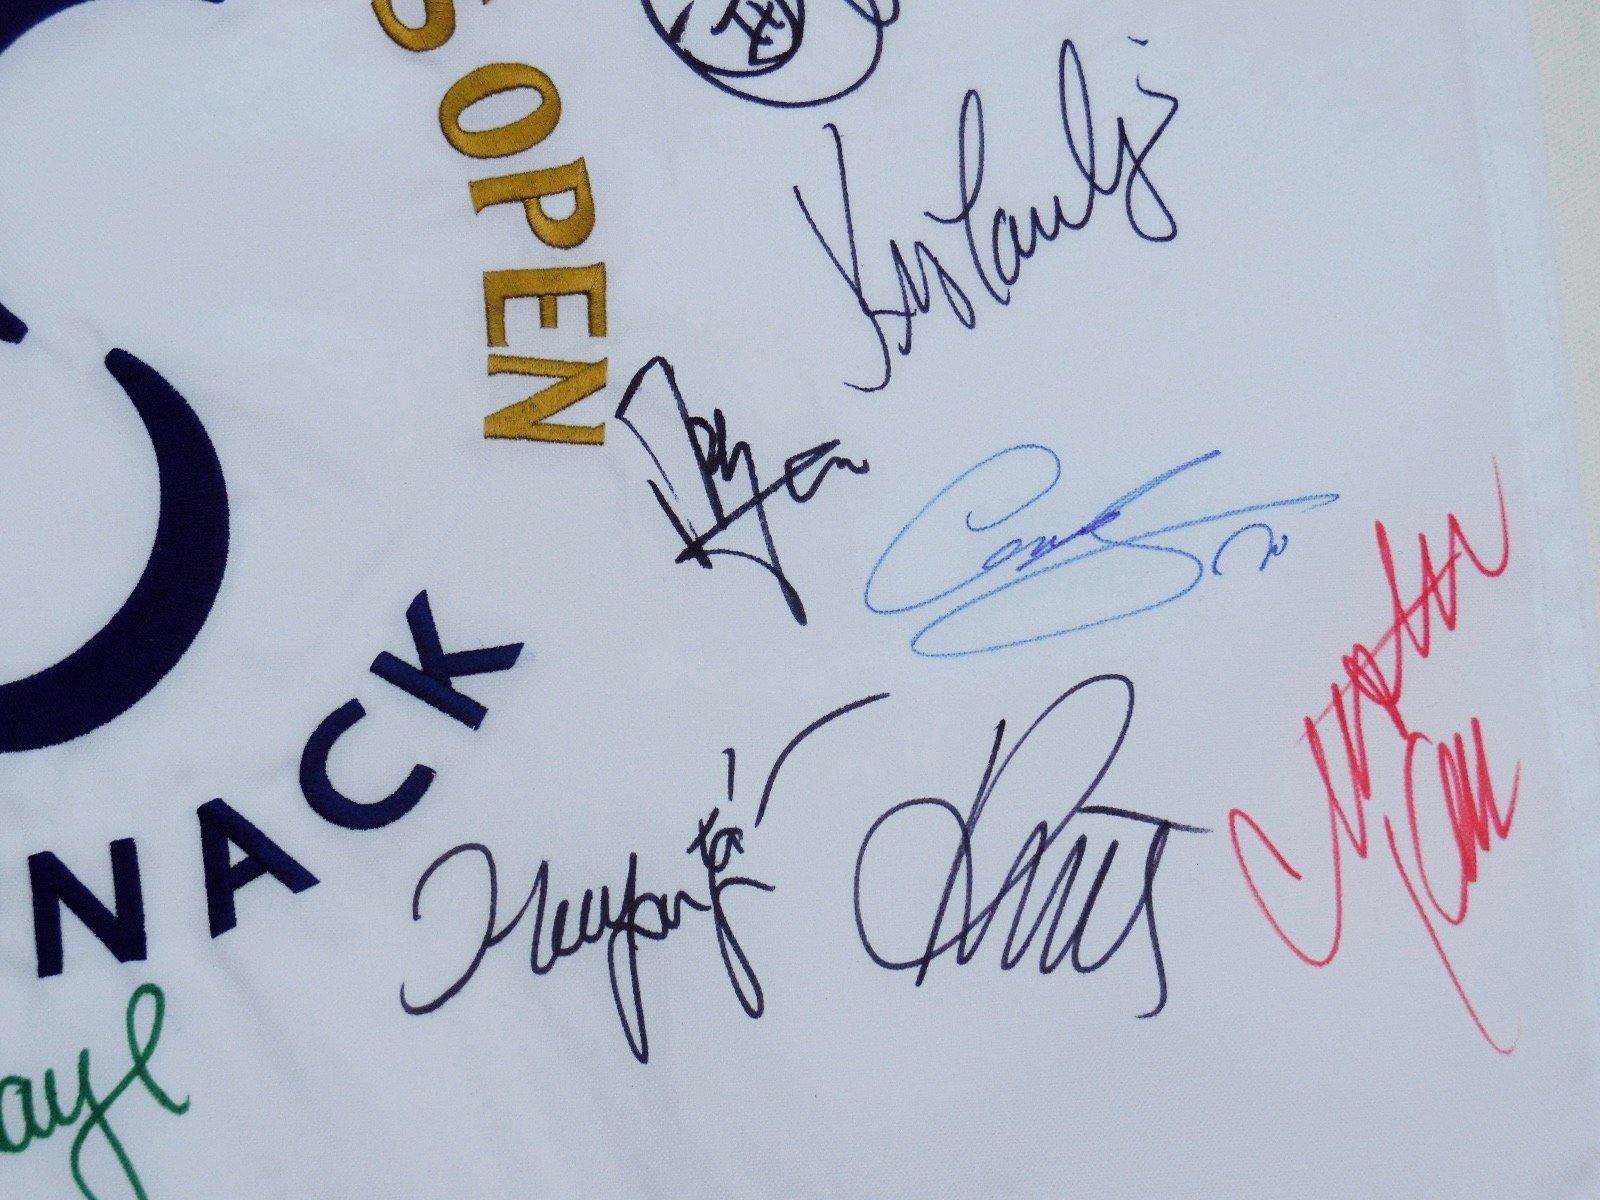 2013 US Womens Open Autographed Golf Flag (LPGA) Nordqvist, Kim, Pressel, Kerr, Yang, etc.